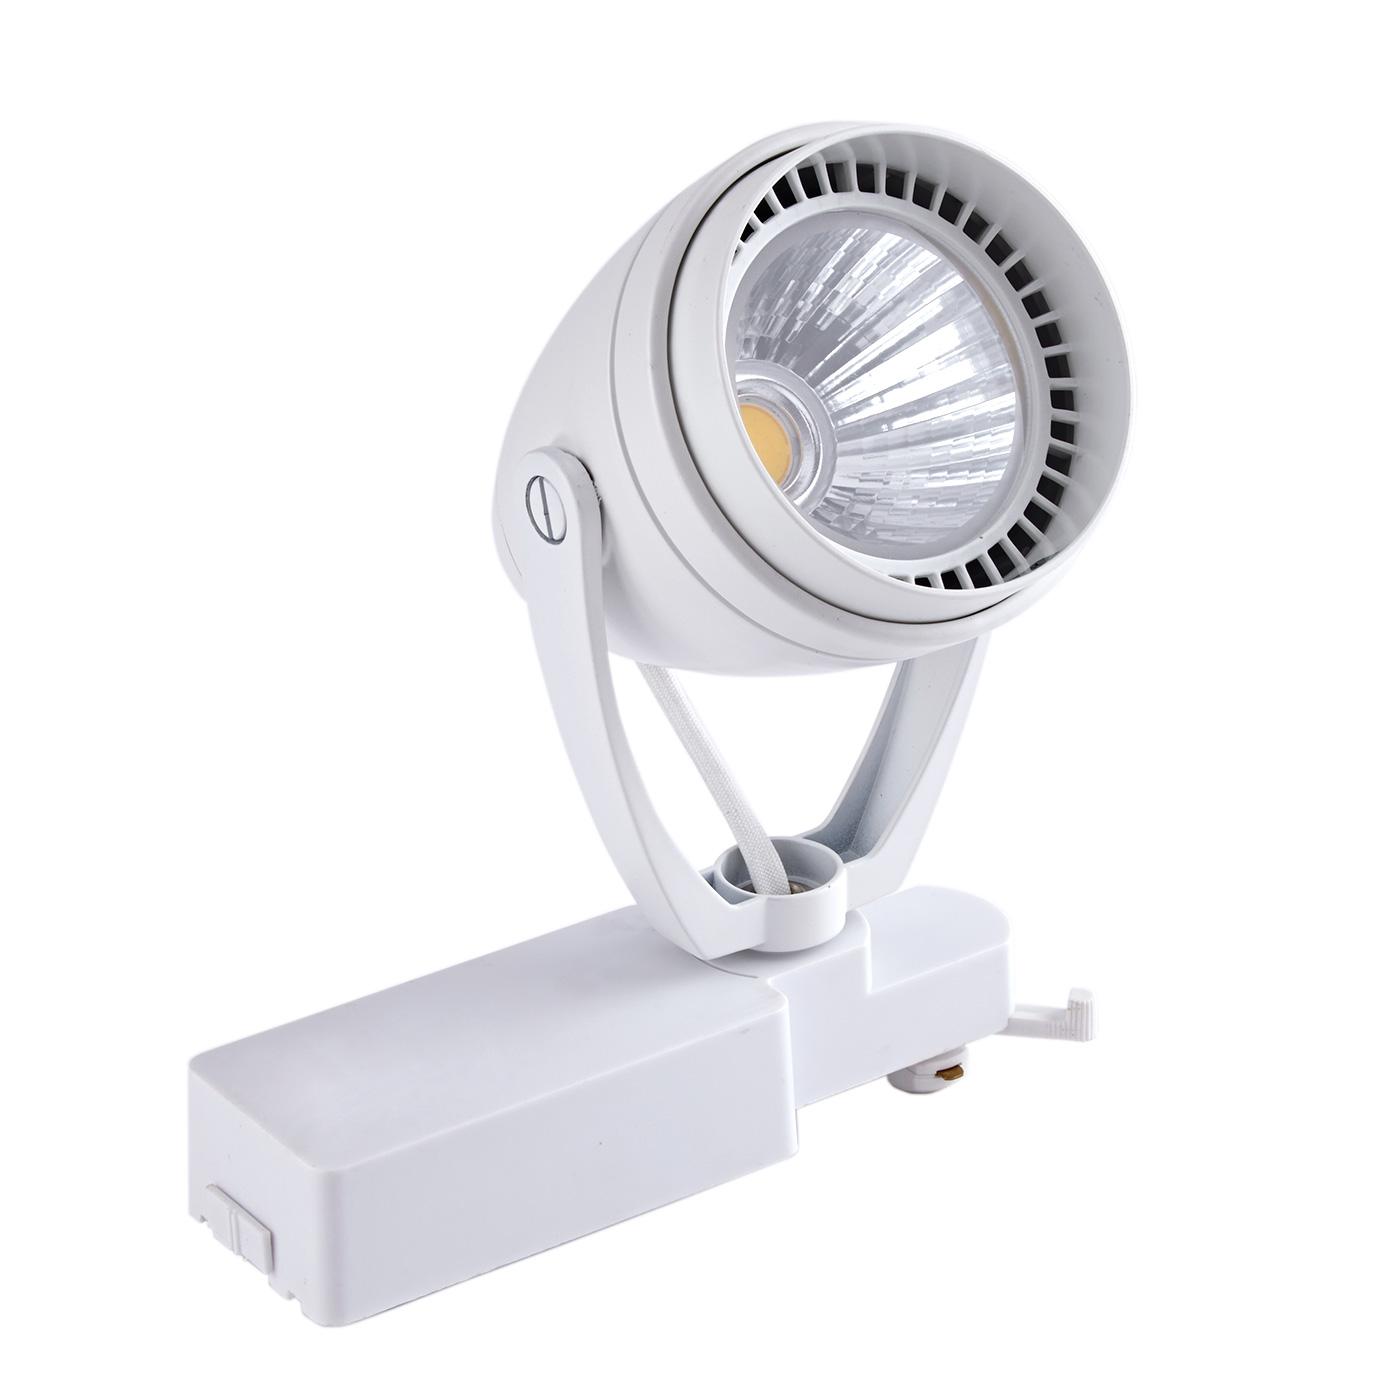 Biard LED 12W Track Light - White